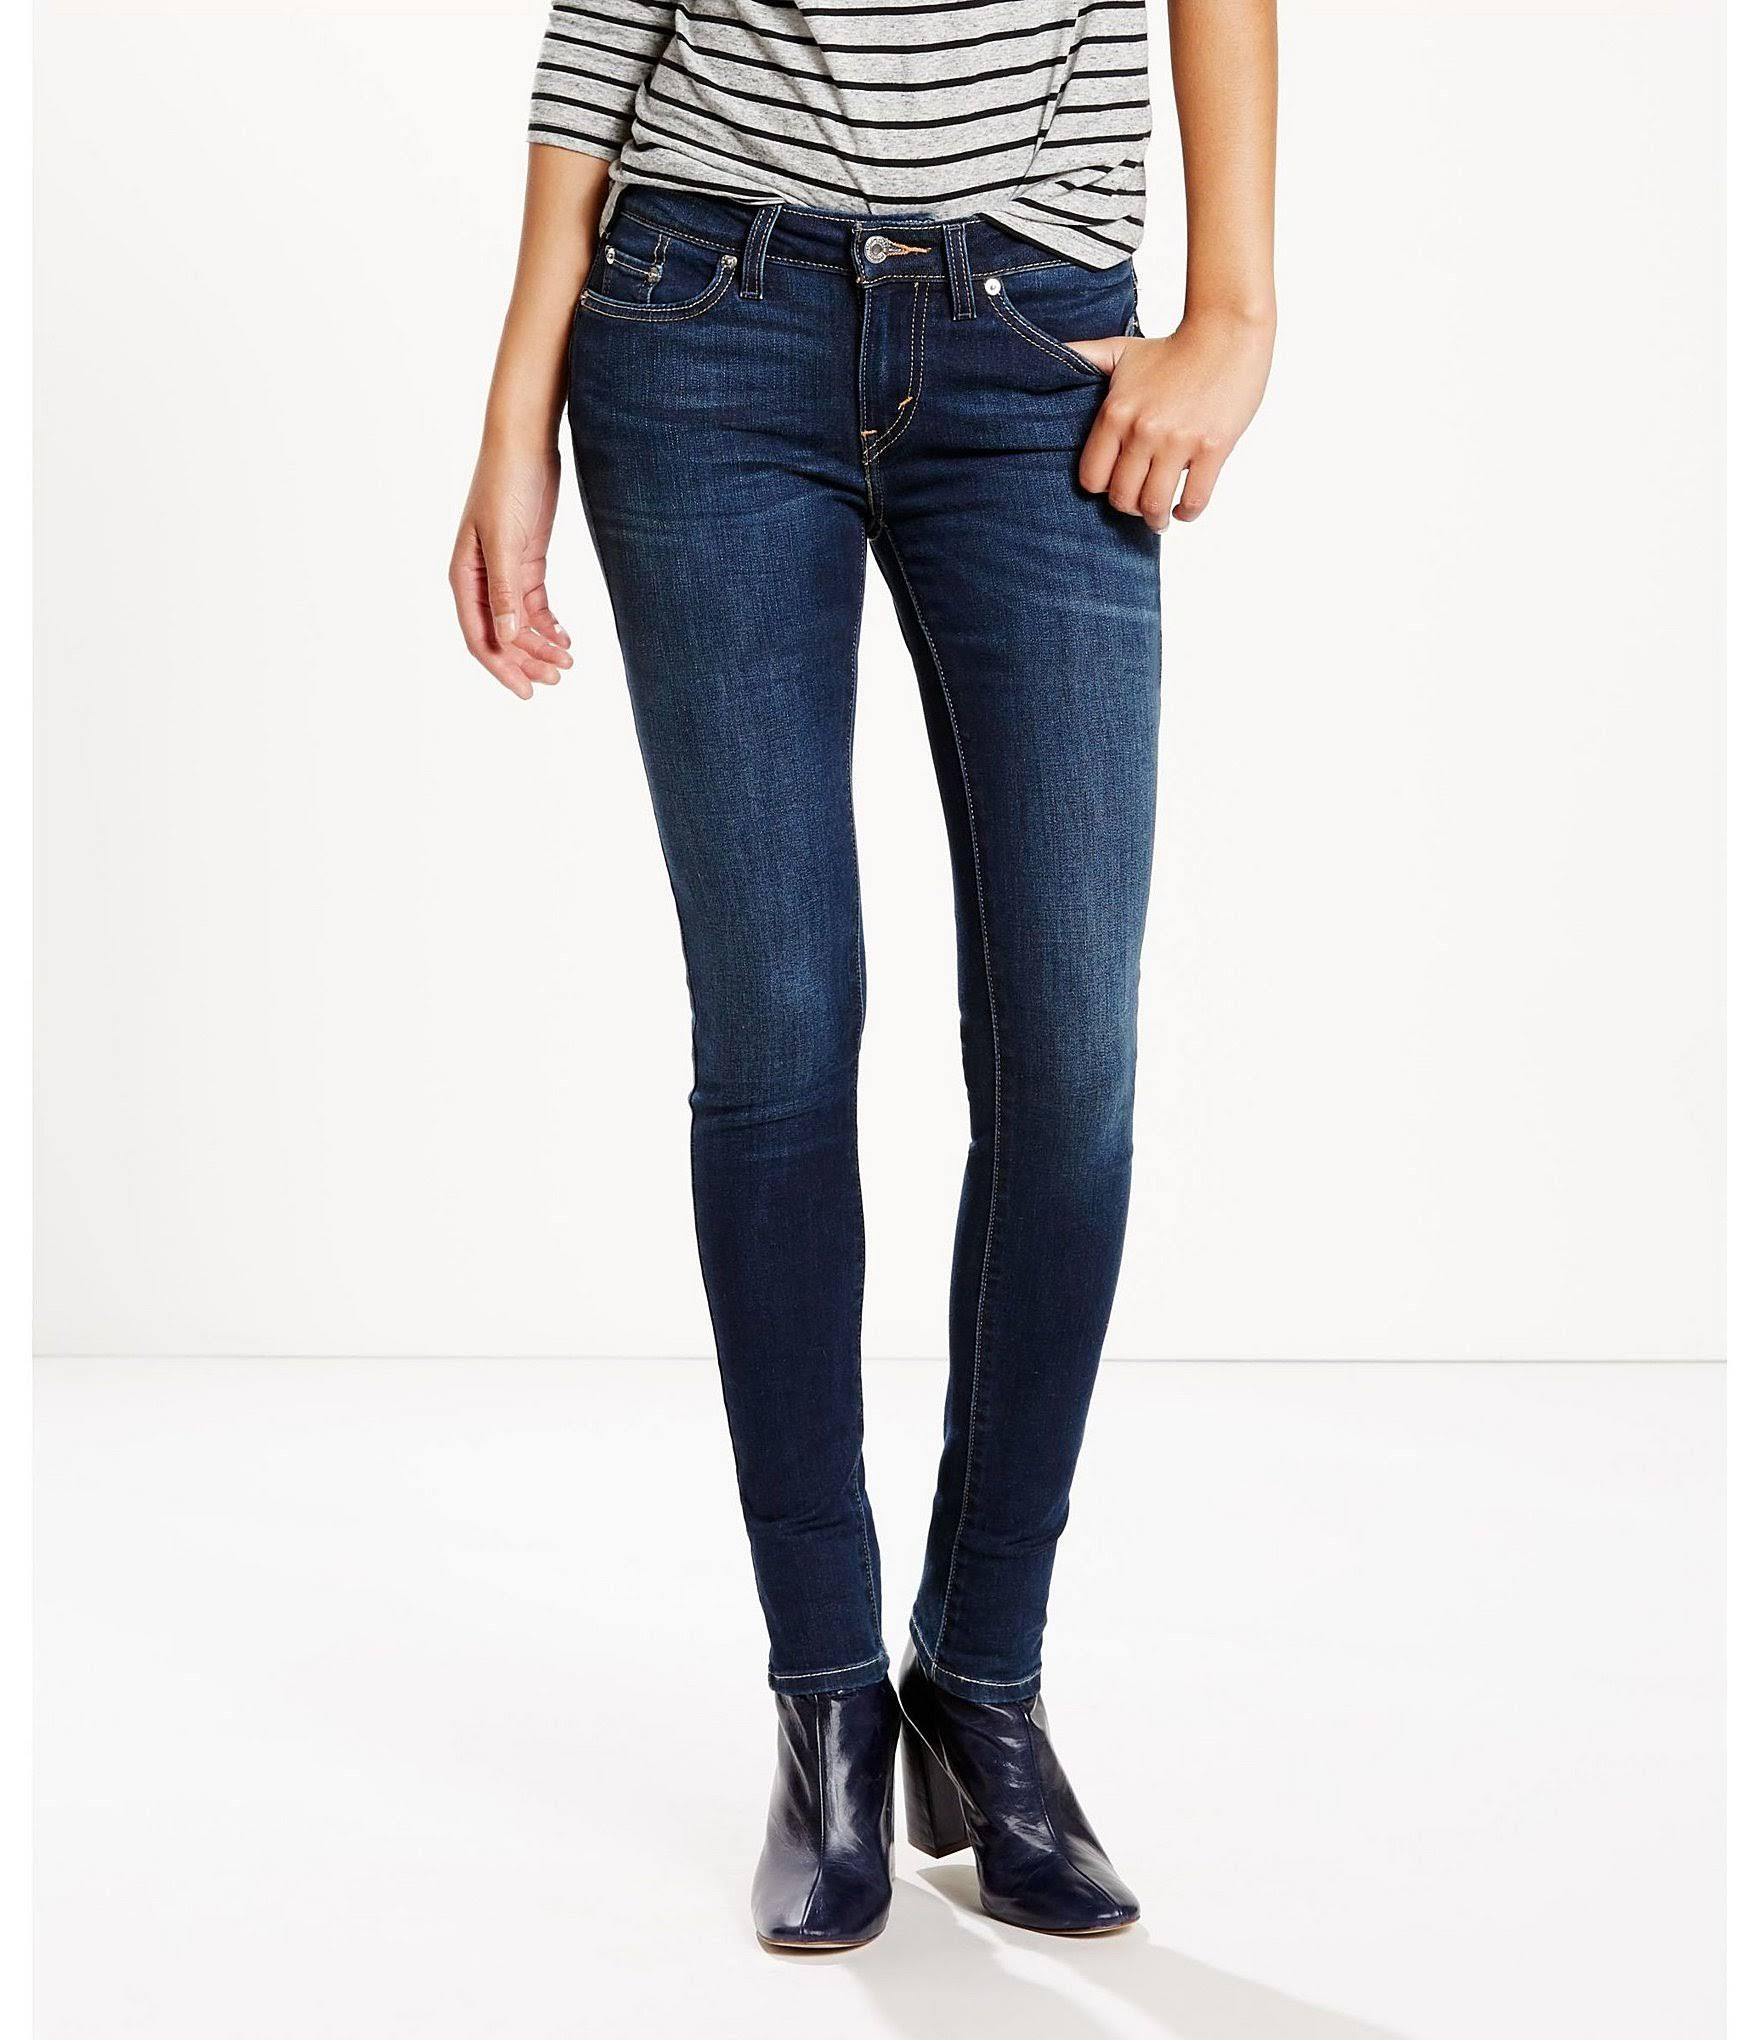 Für Jeans Super Levi's 535 Damen Skinny qBwpxOIPA